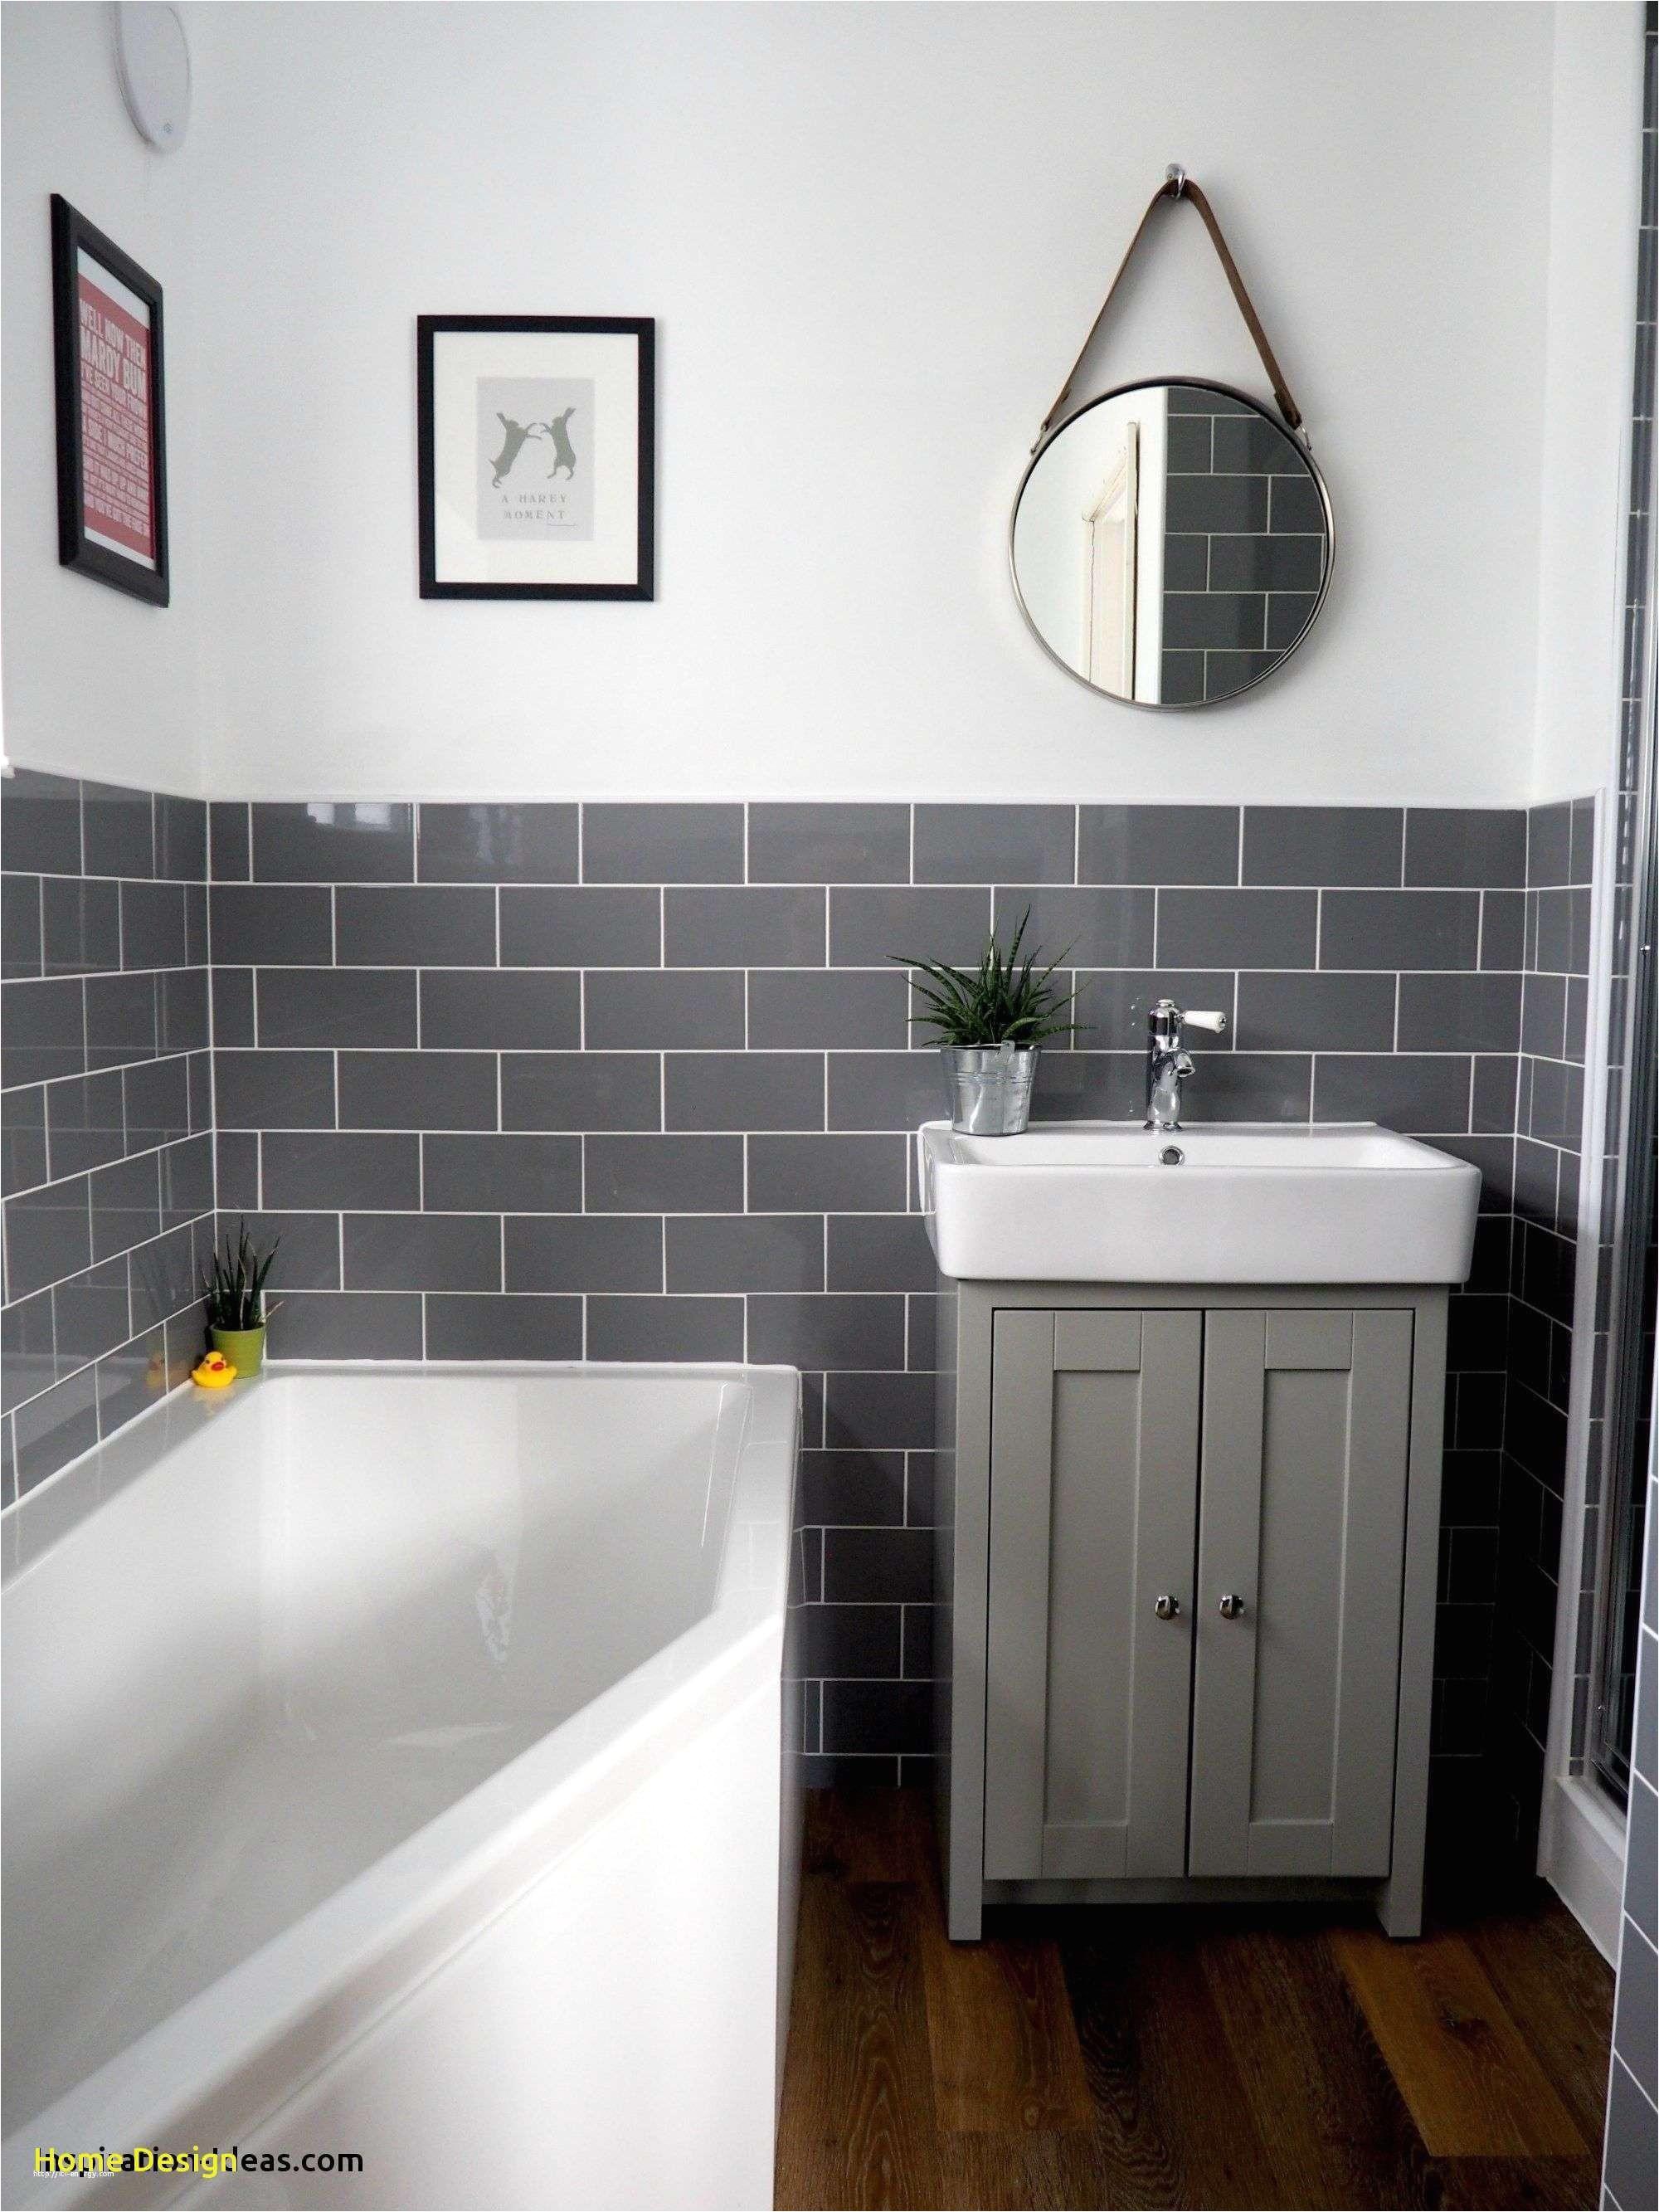 bathroom 38 bathroom design ideas beautiful awesome bathroom picture ideas lovely tag toilet ideas 0d bathroom designs bathroom tile designs for small